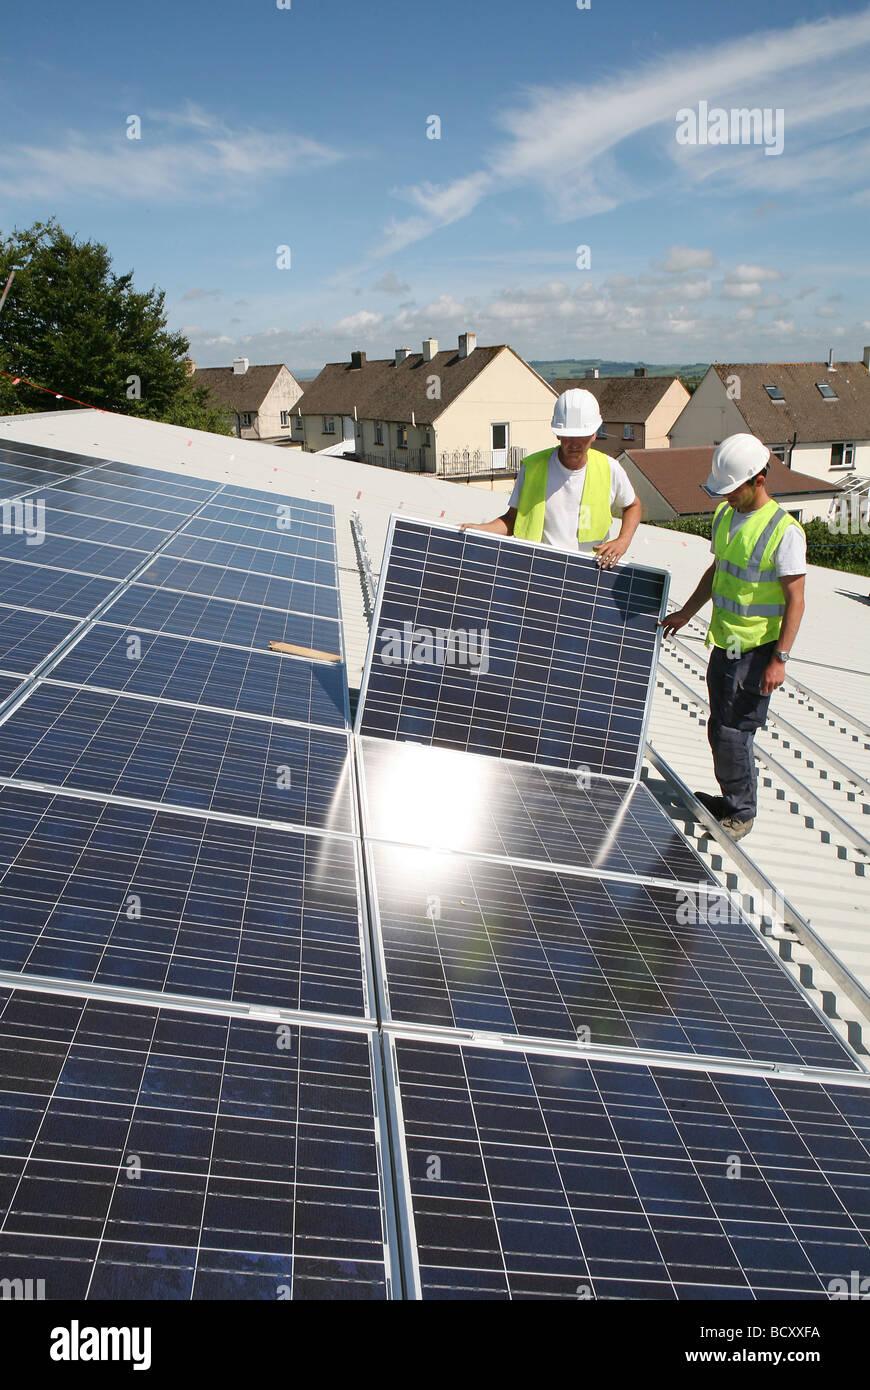 2 Männer installieren Photovoltaik-Zellen Stockbild